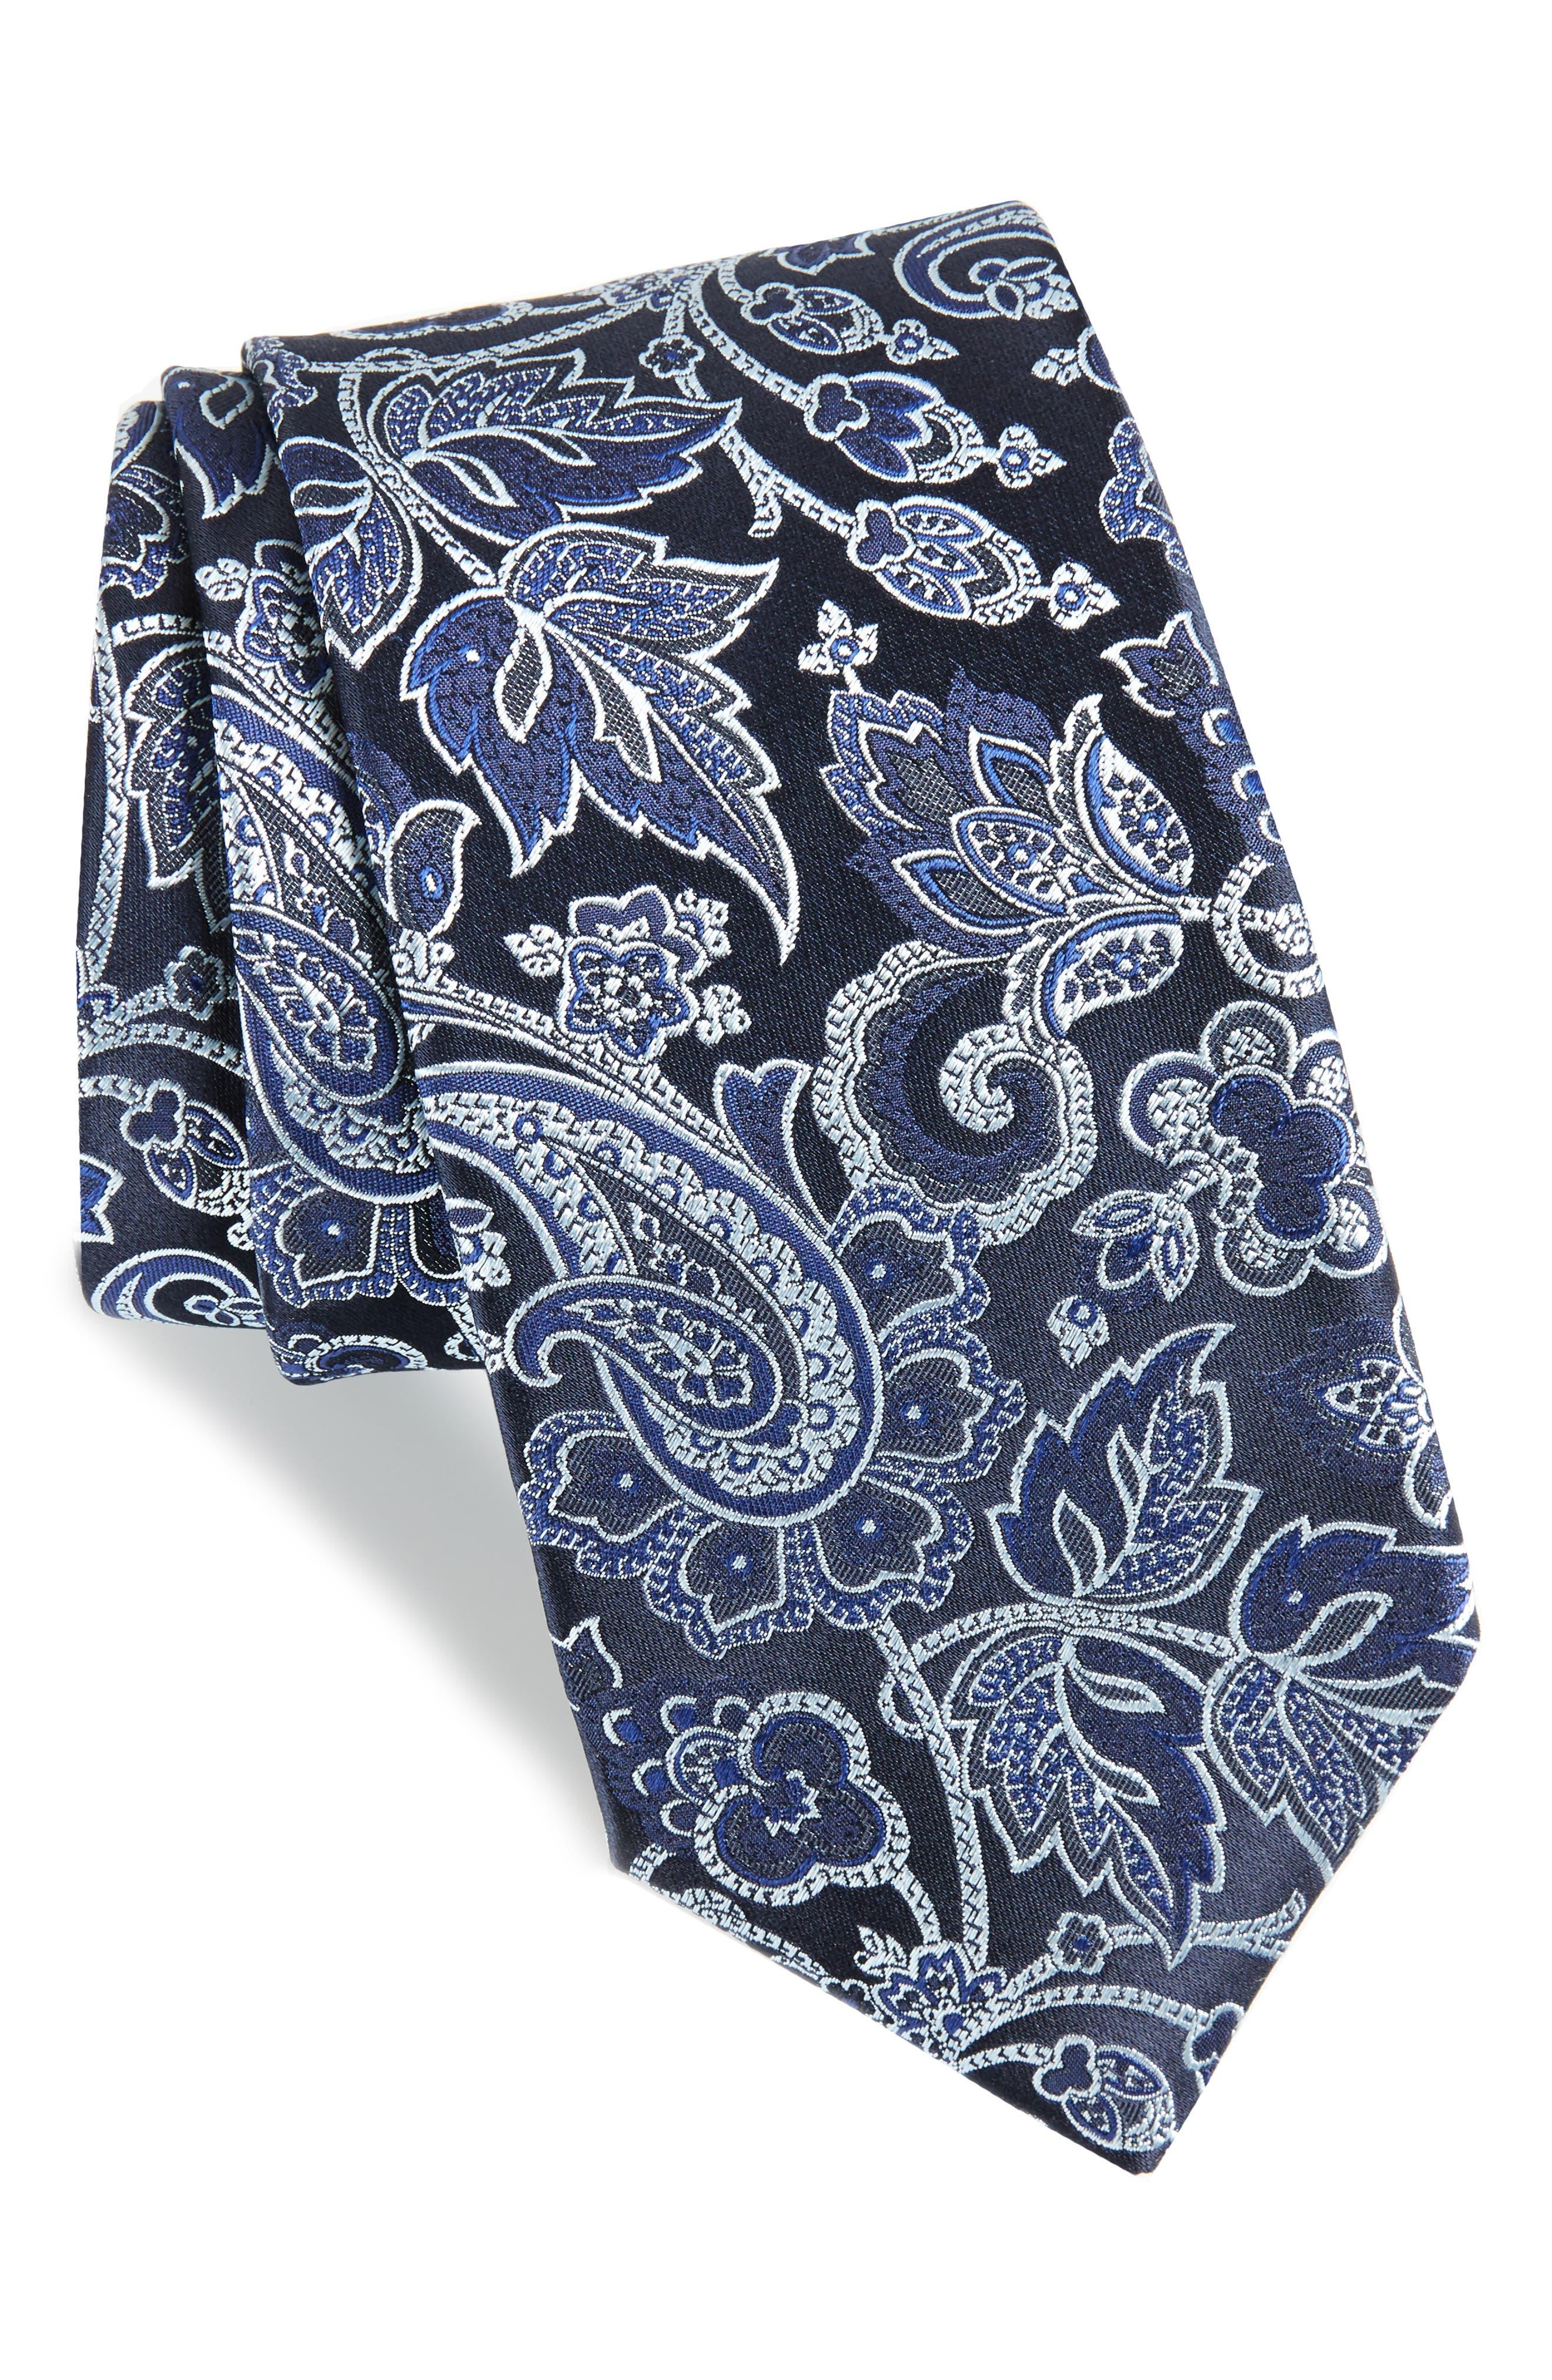 Paisley Silk Tie,                             Main thumbnail 1, color,                             Black/ Navy